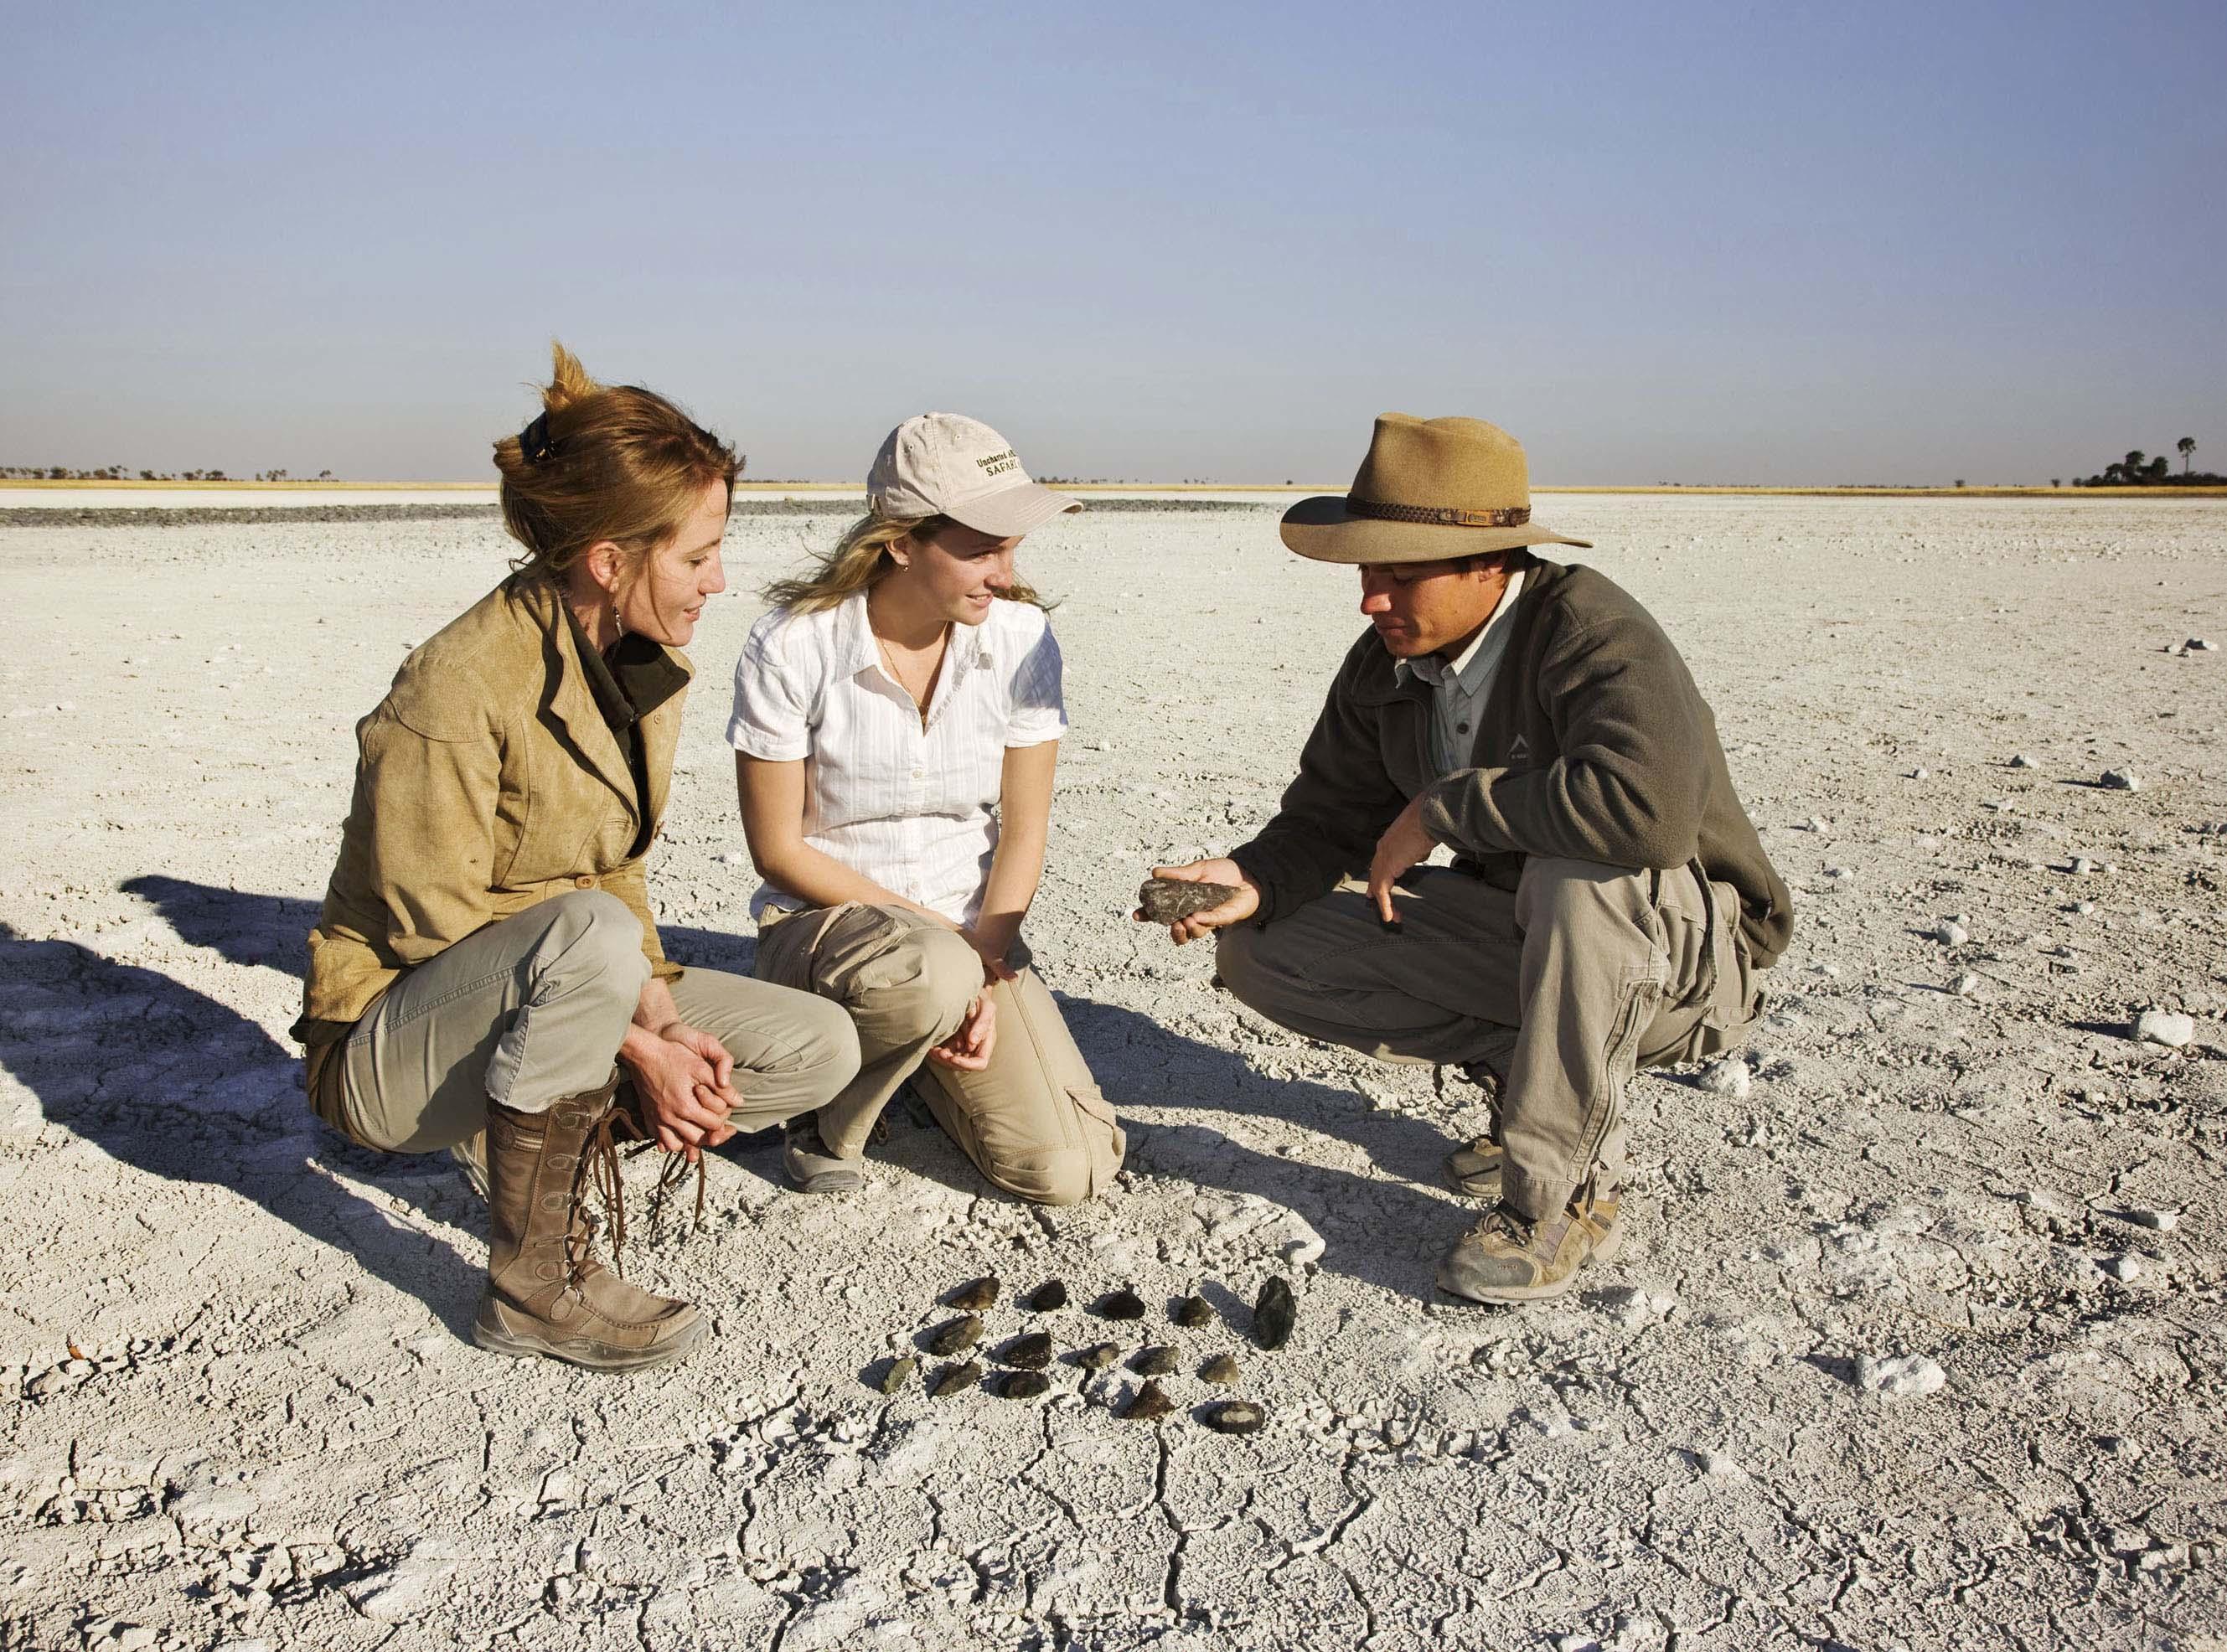 Stone tools in the Kalahari